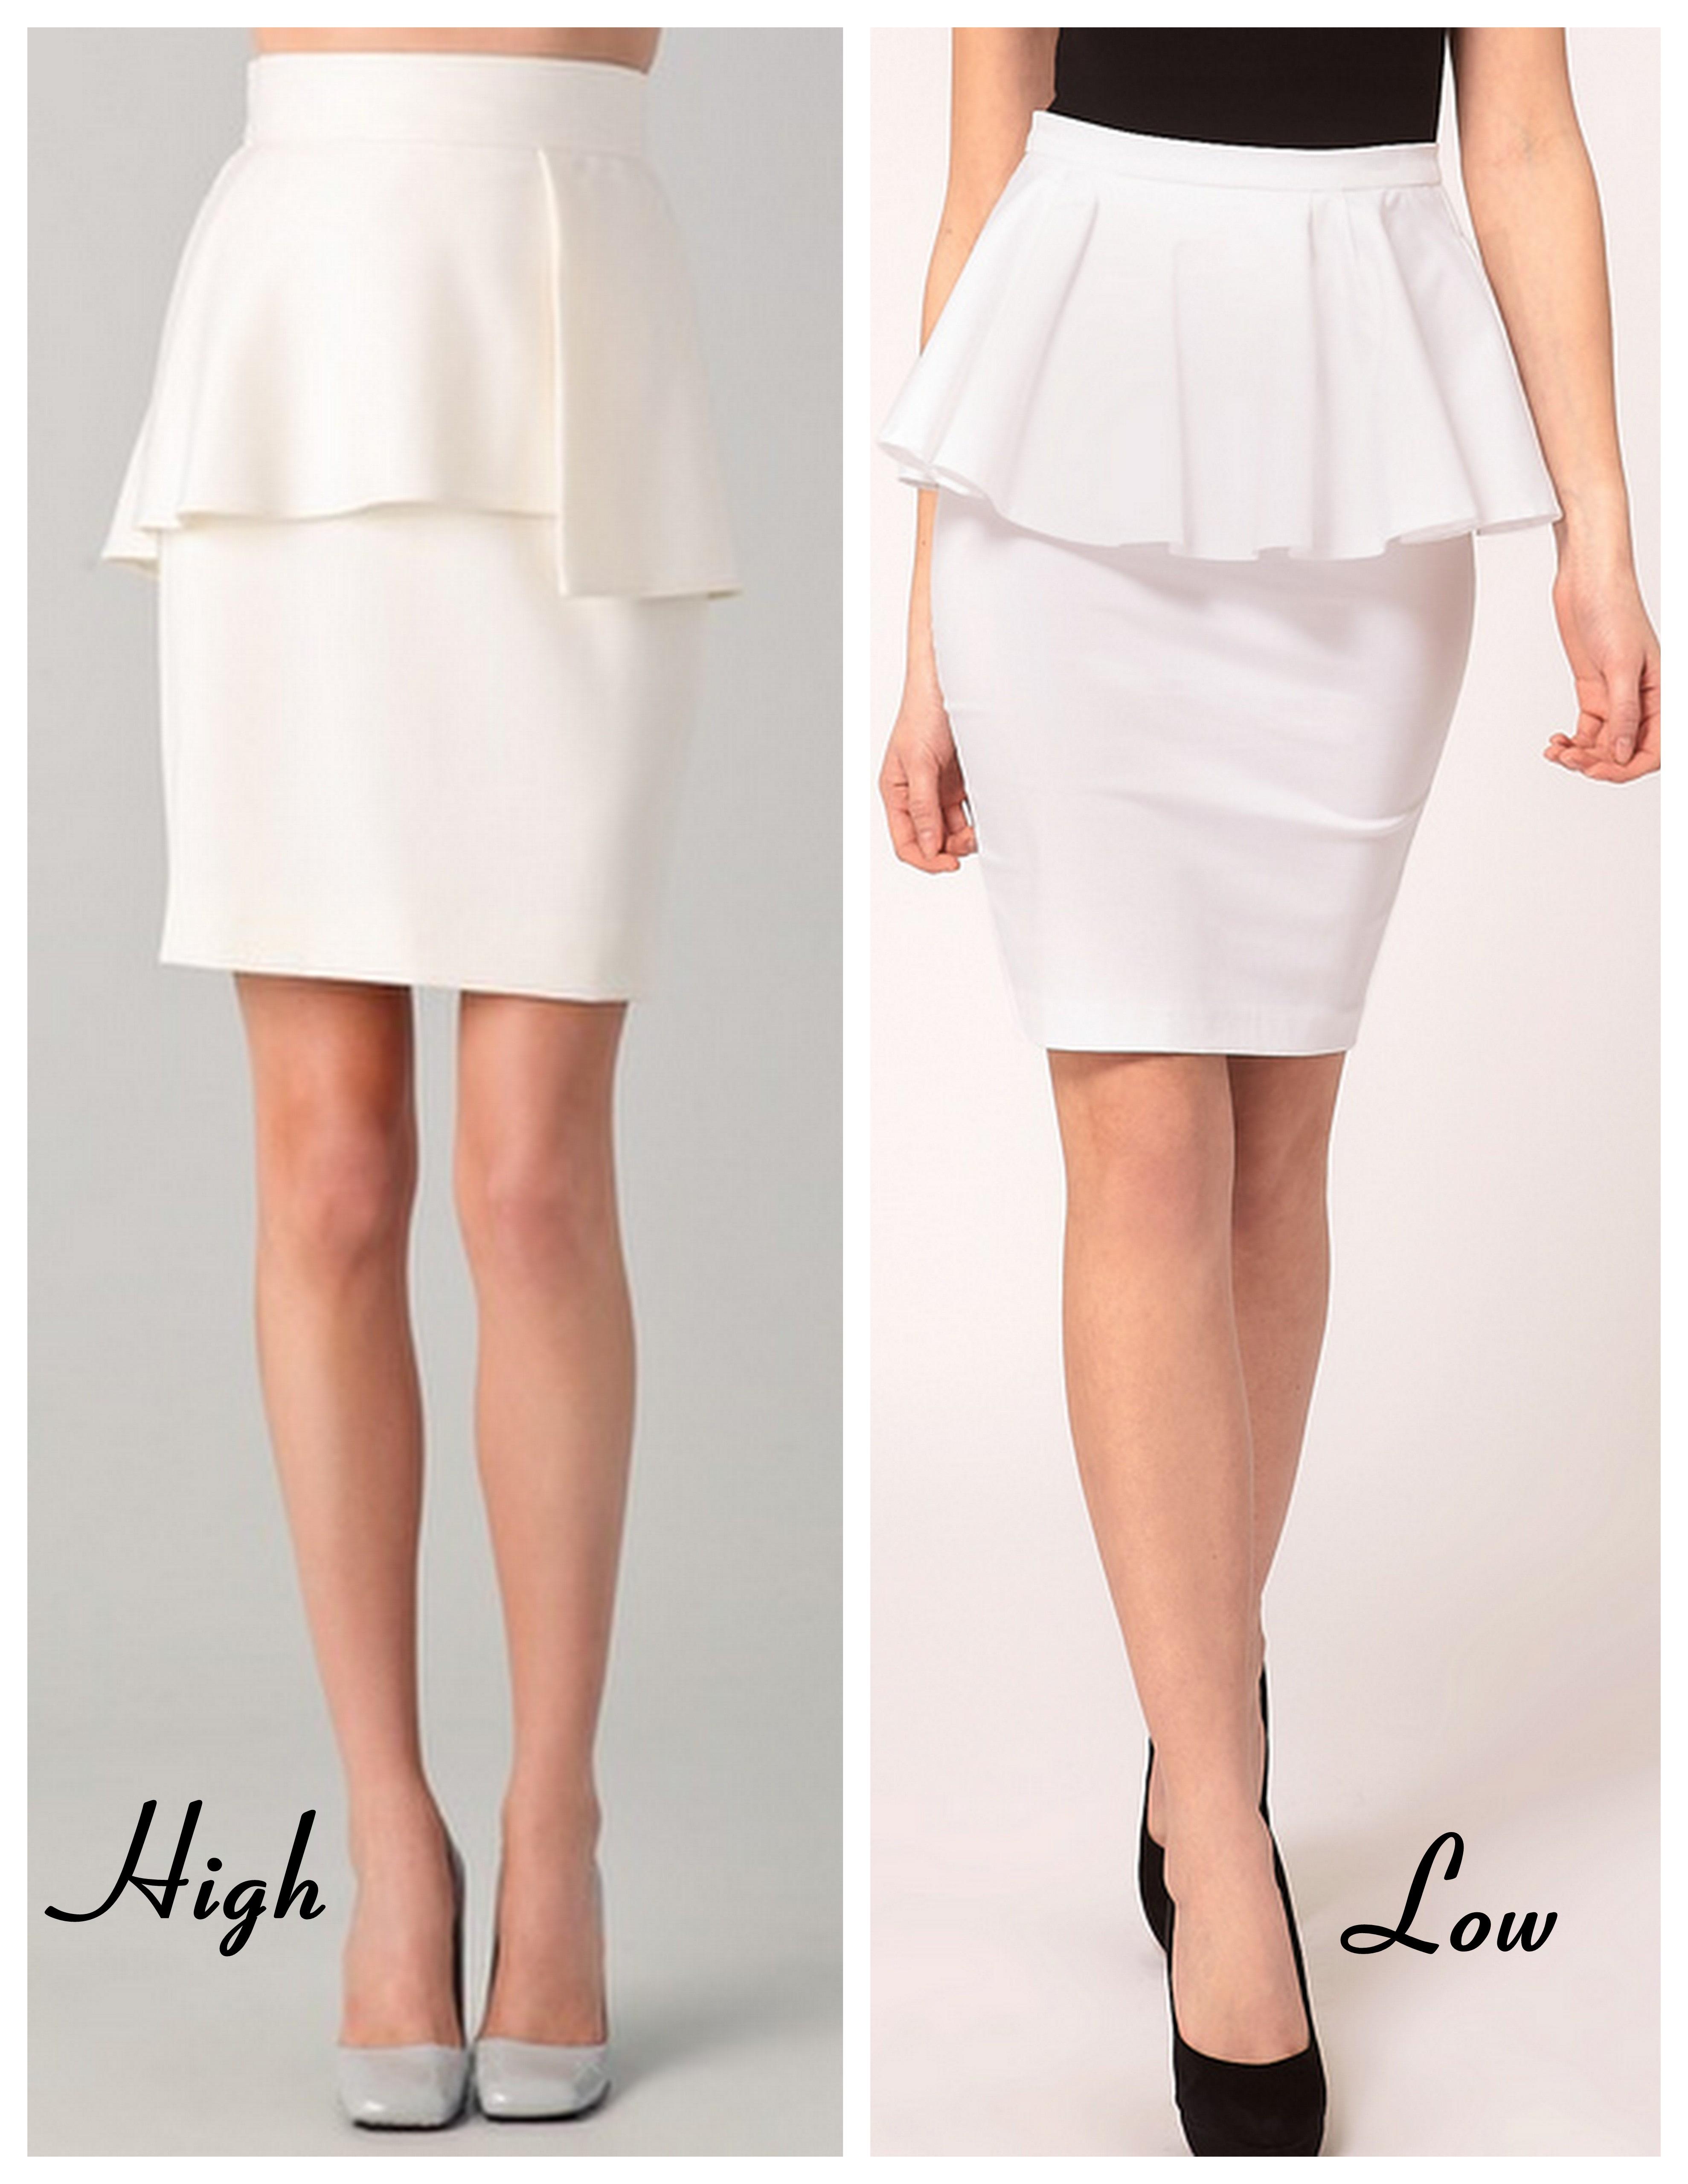 high low bracelets peplum skirts sunglass